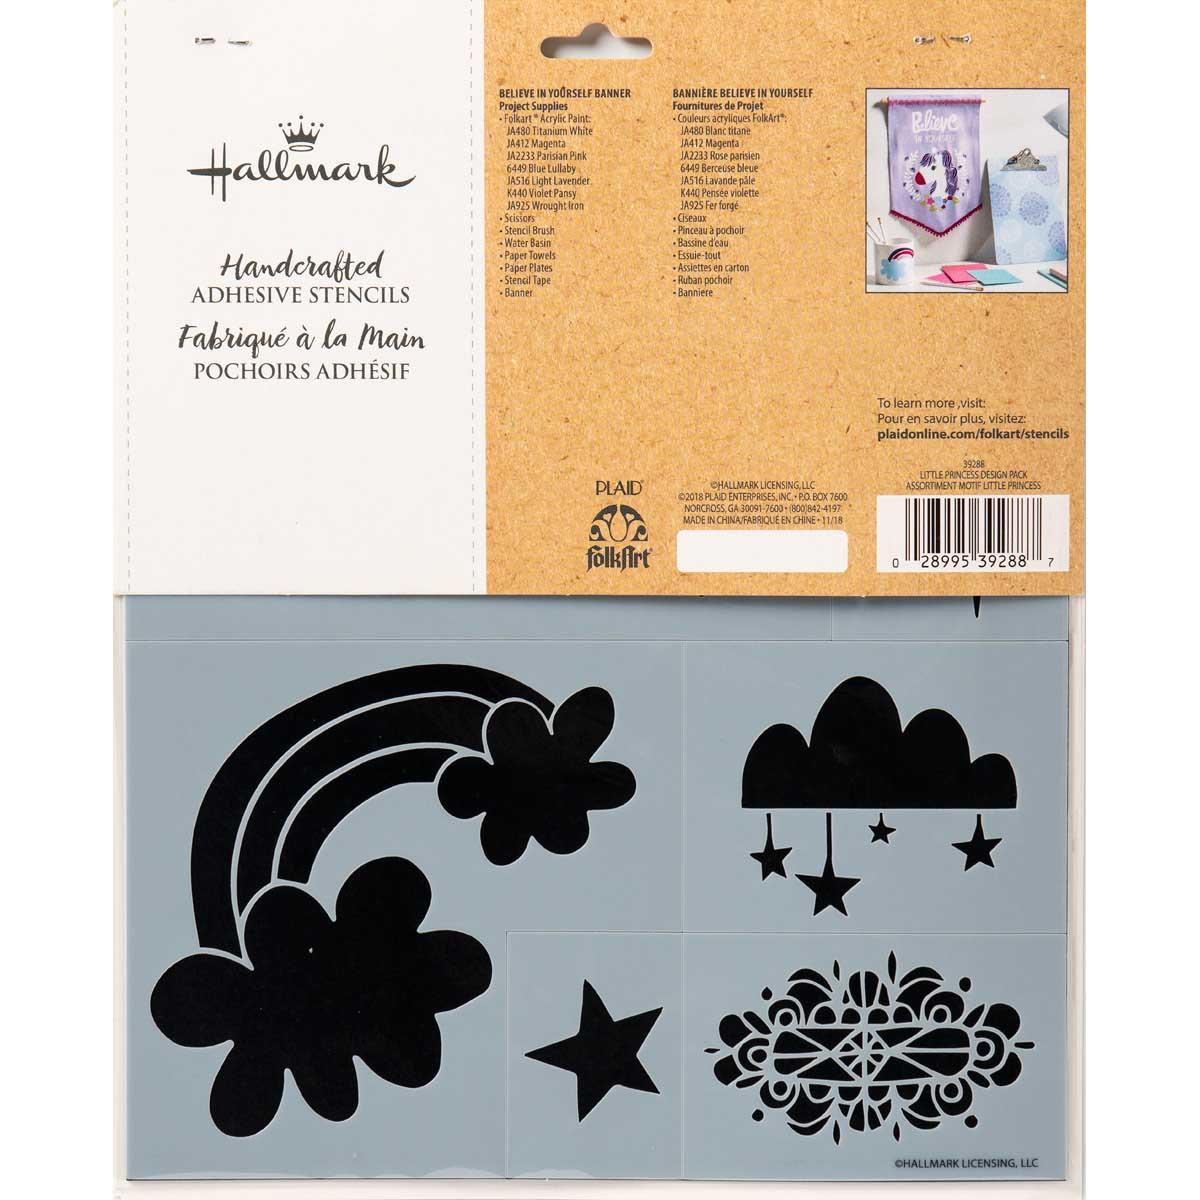 Hallmark Handcrafted Adhesive Stencils - Little Princess Design Pack, 8-1/2